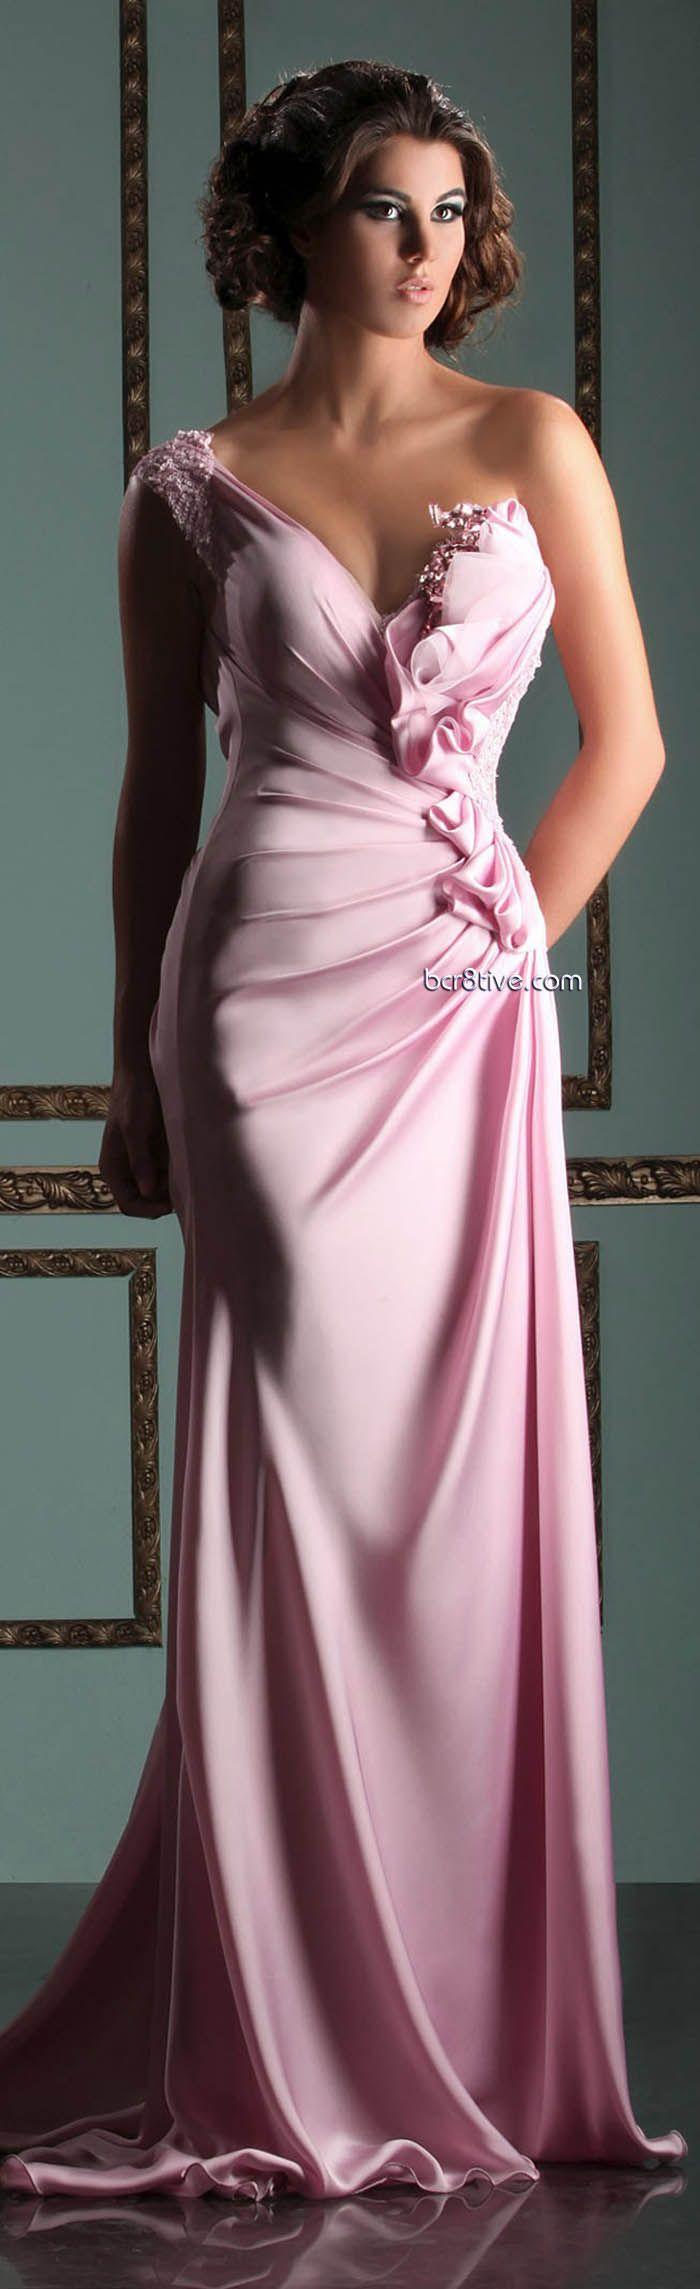 Mireille Dagher Spring Summer 2013 Ready to Wear | Rosas, Vestiditos ...